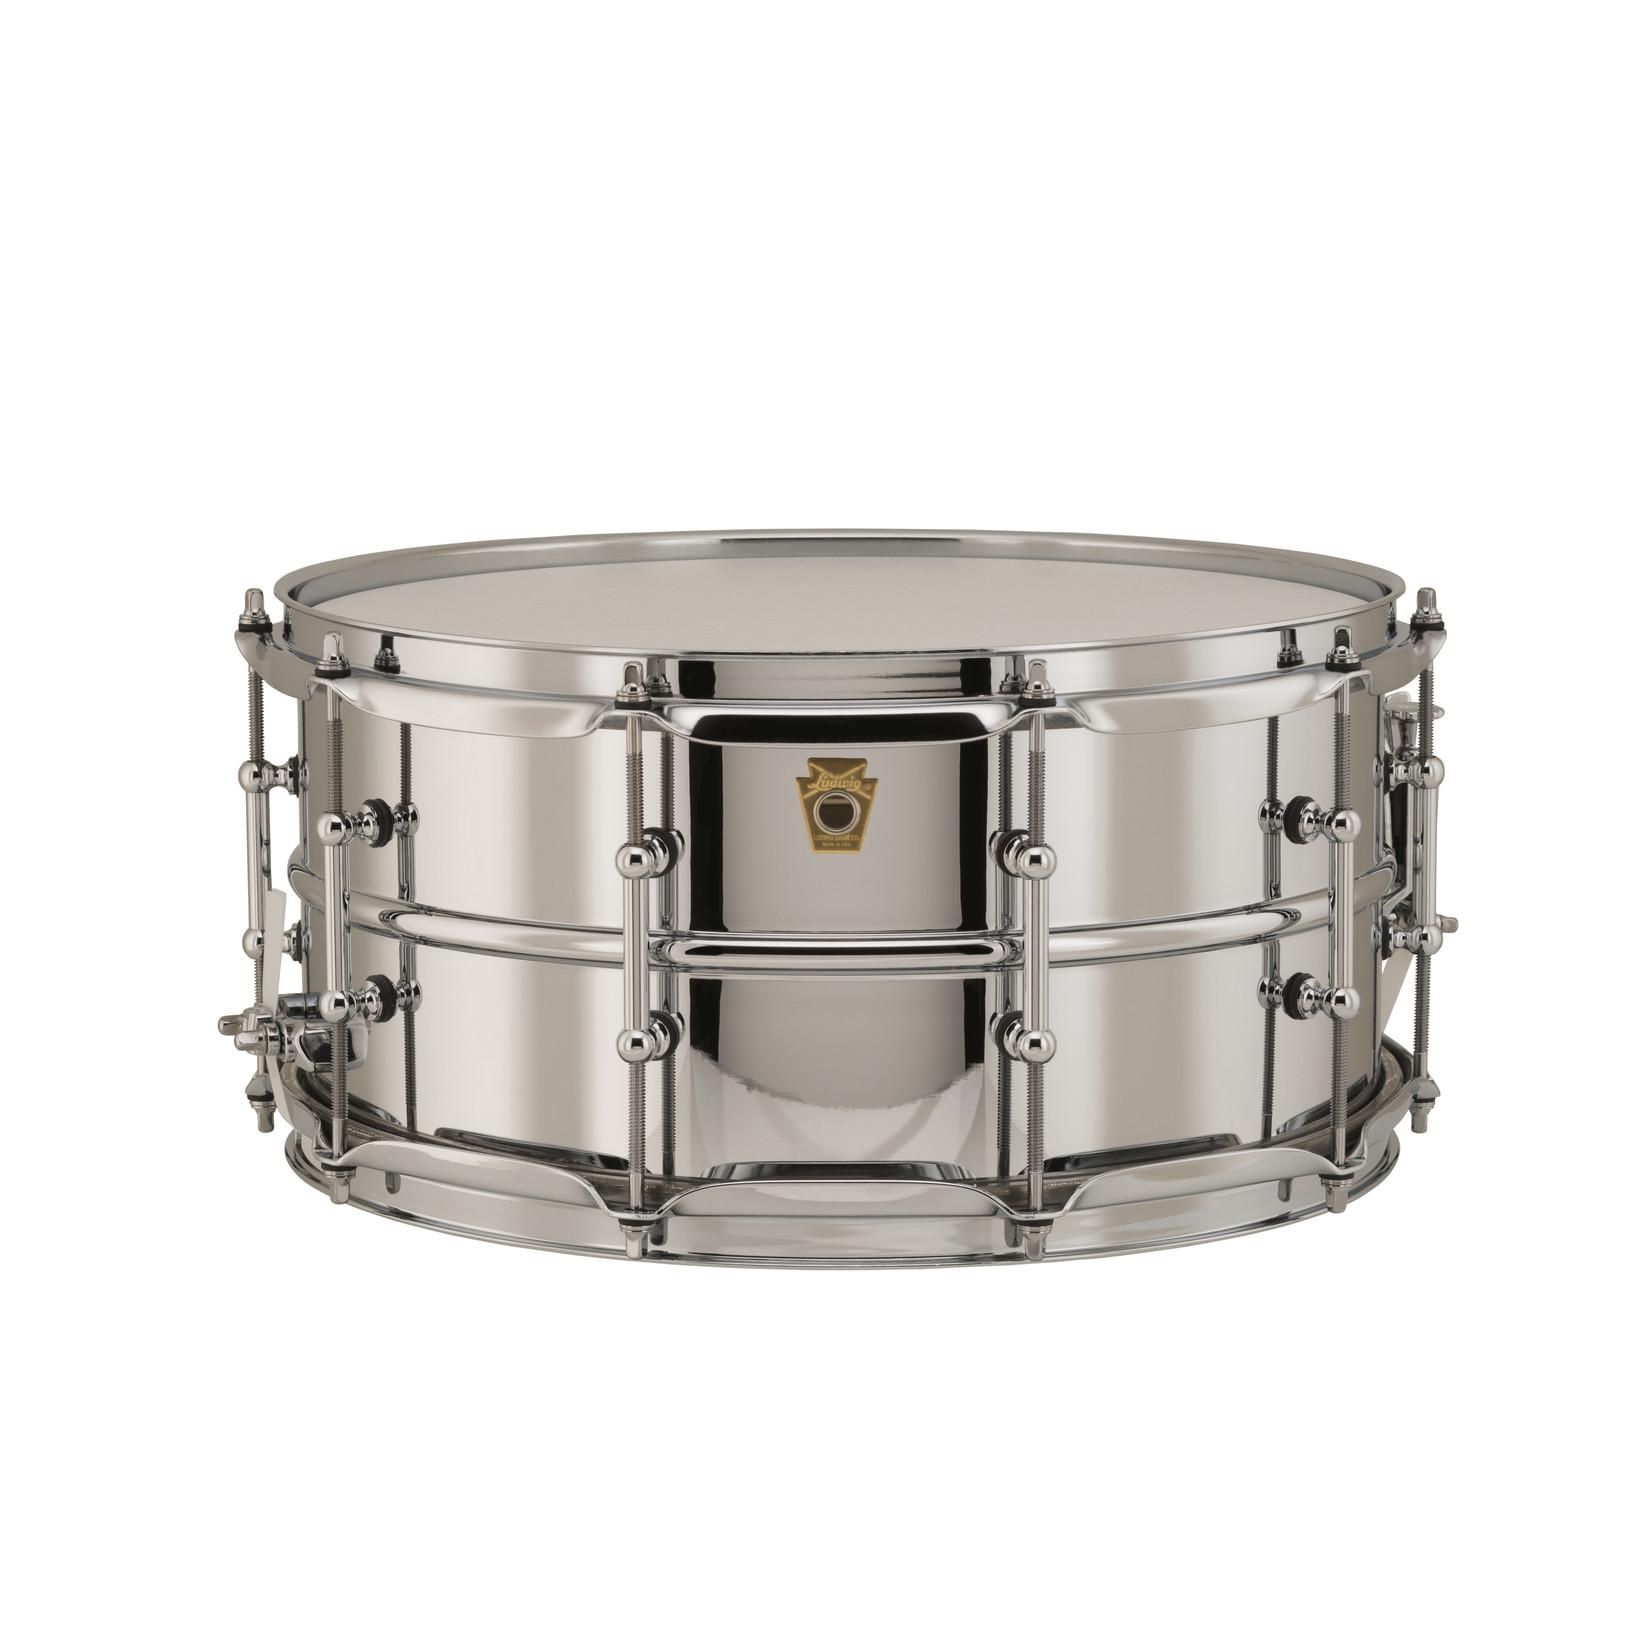 Ludwig Ludwig 6.5X14 Supraphonic Chrome over Brass Snare Drum / Tube Lugs / Chrome Hardware